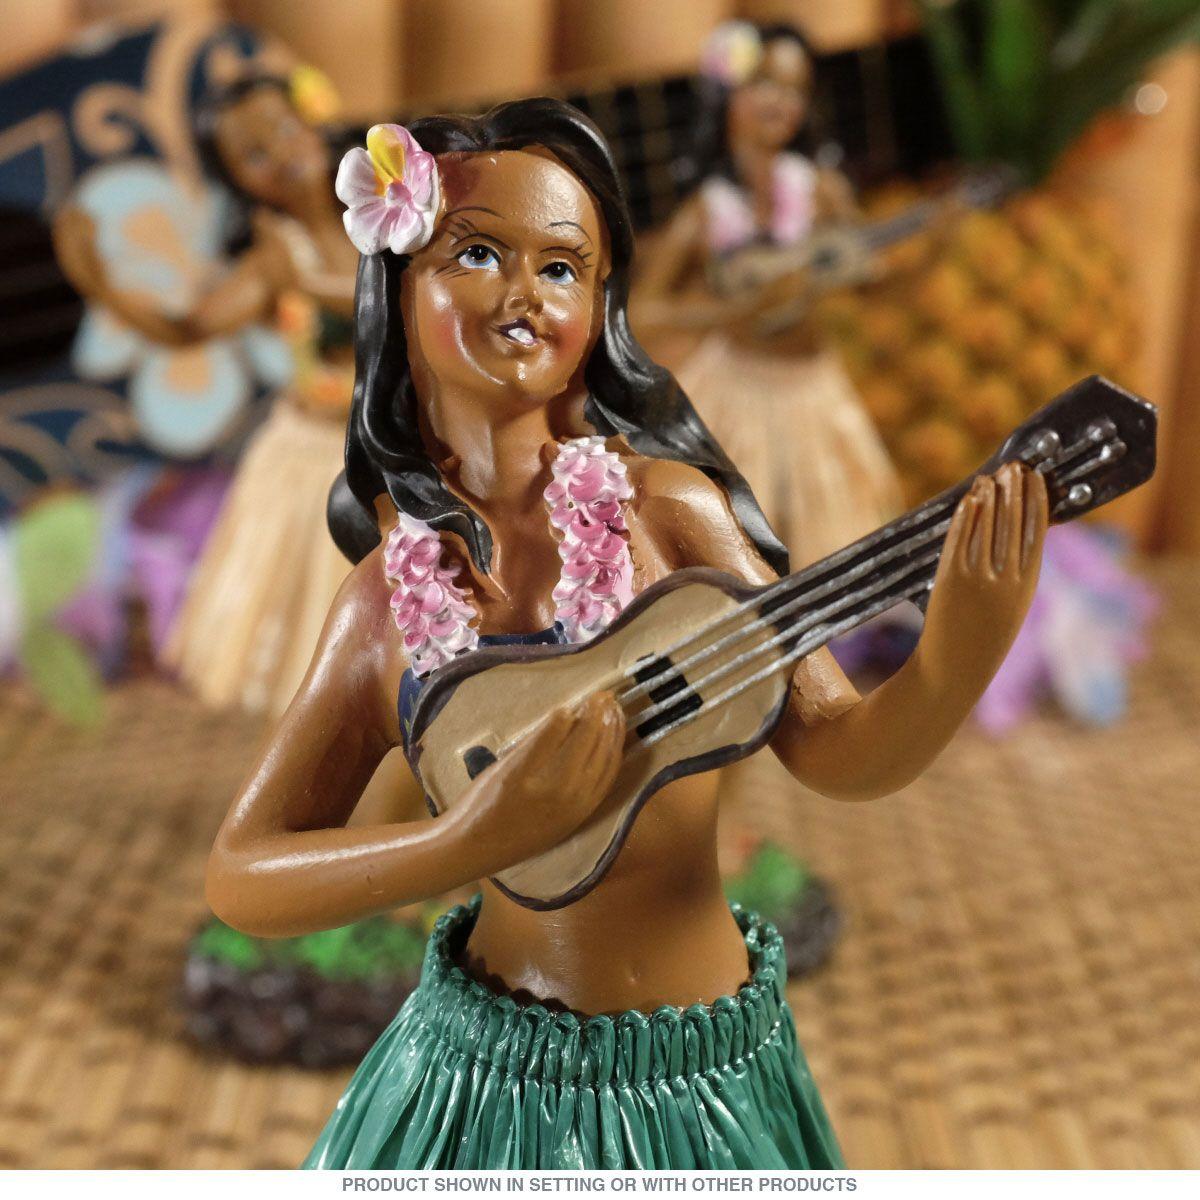 Hawaiian Ukulele Dashboard Hula Doll Tan Skirt Vintage Style Tiki Decor 2 x 7